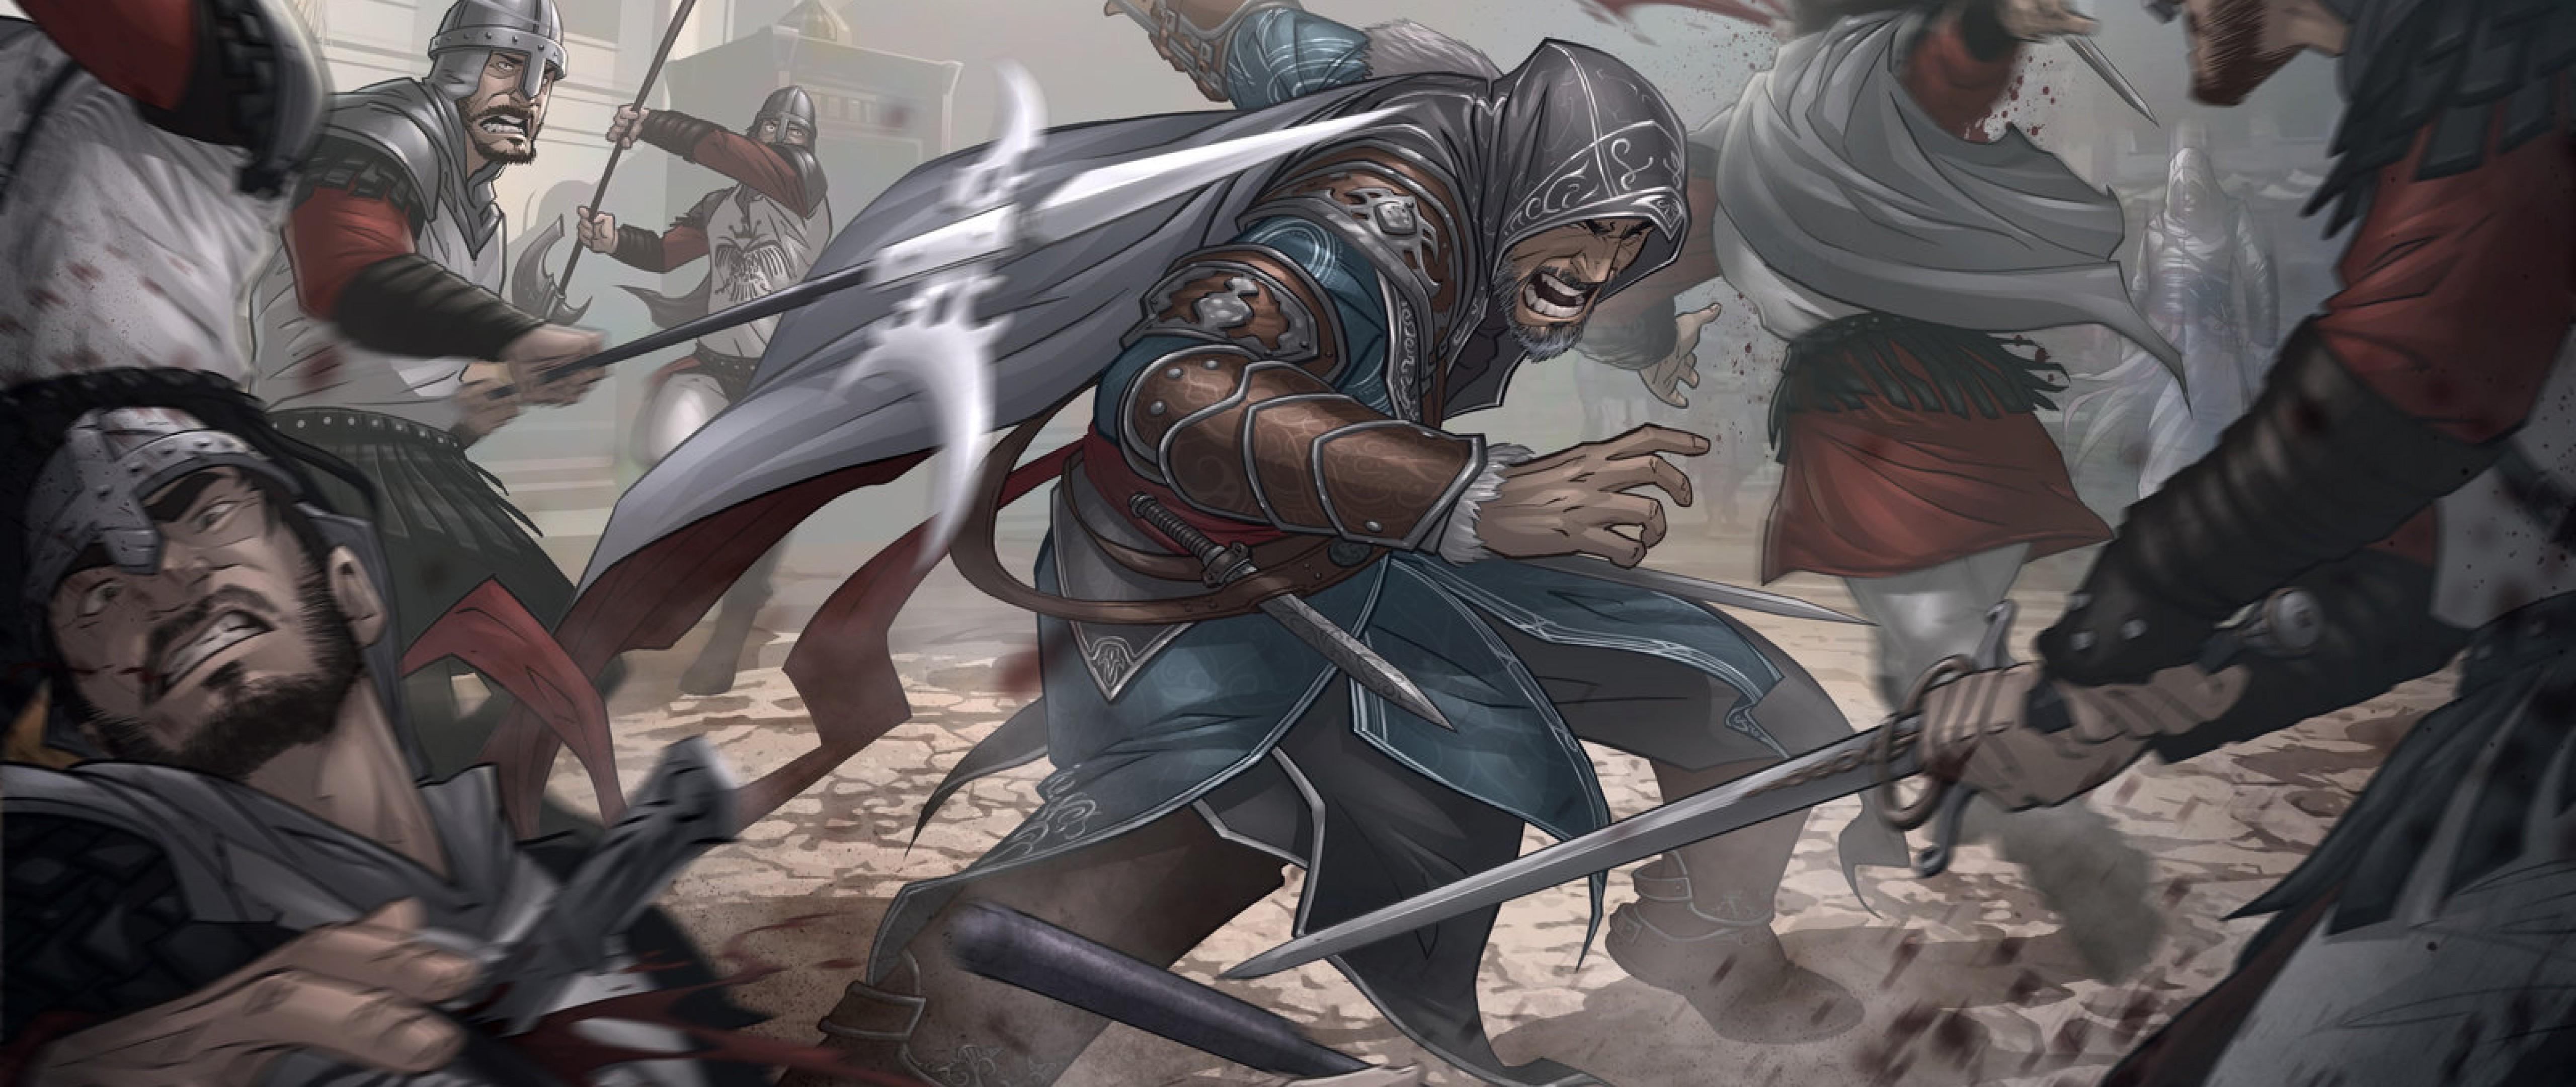 Assassins Creed Art Hd Wallpaper 4k Ultra Hd Wide Tv Hd